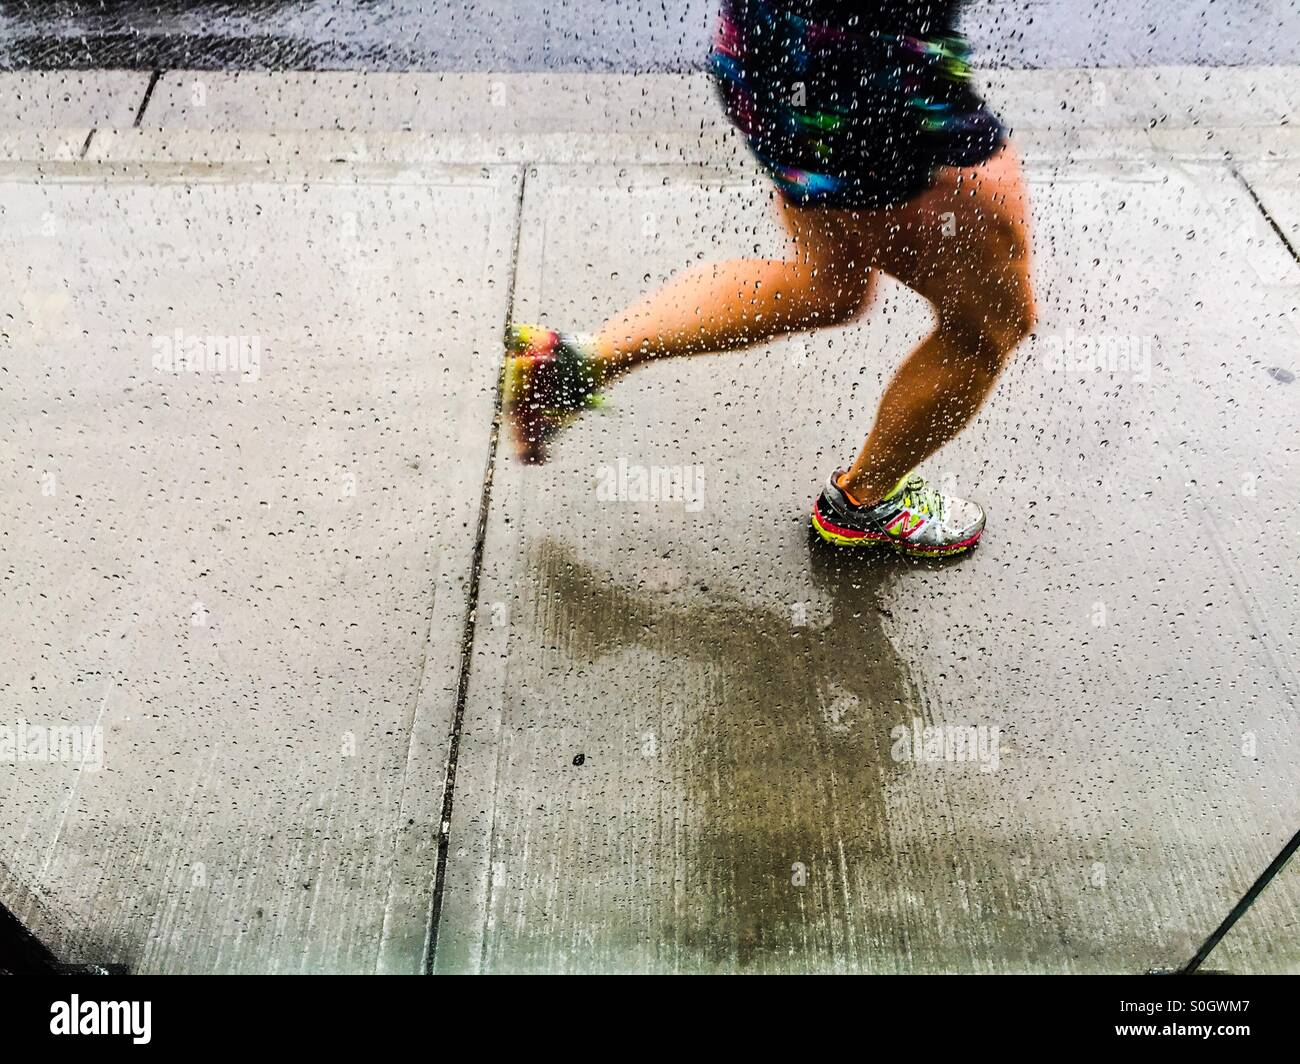 En el emparejador de lluvia Imagen De Stock